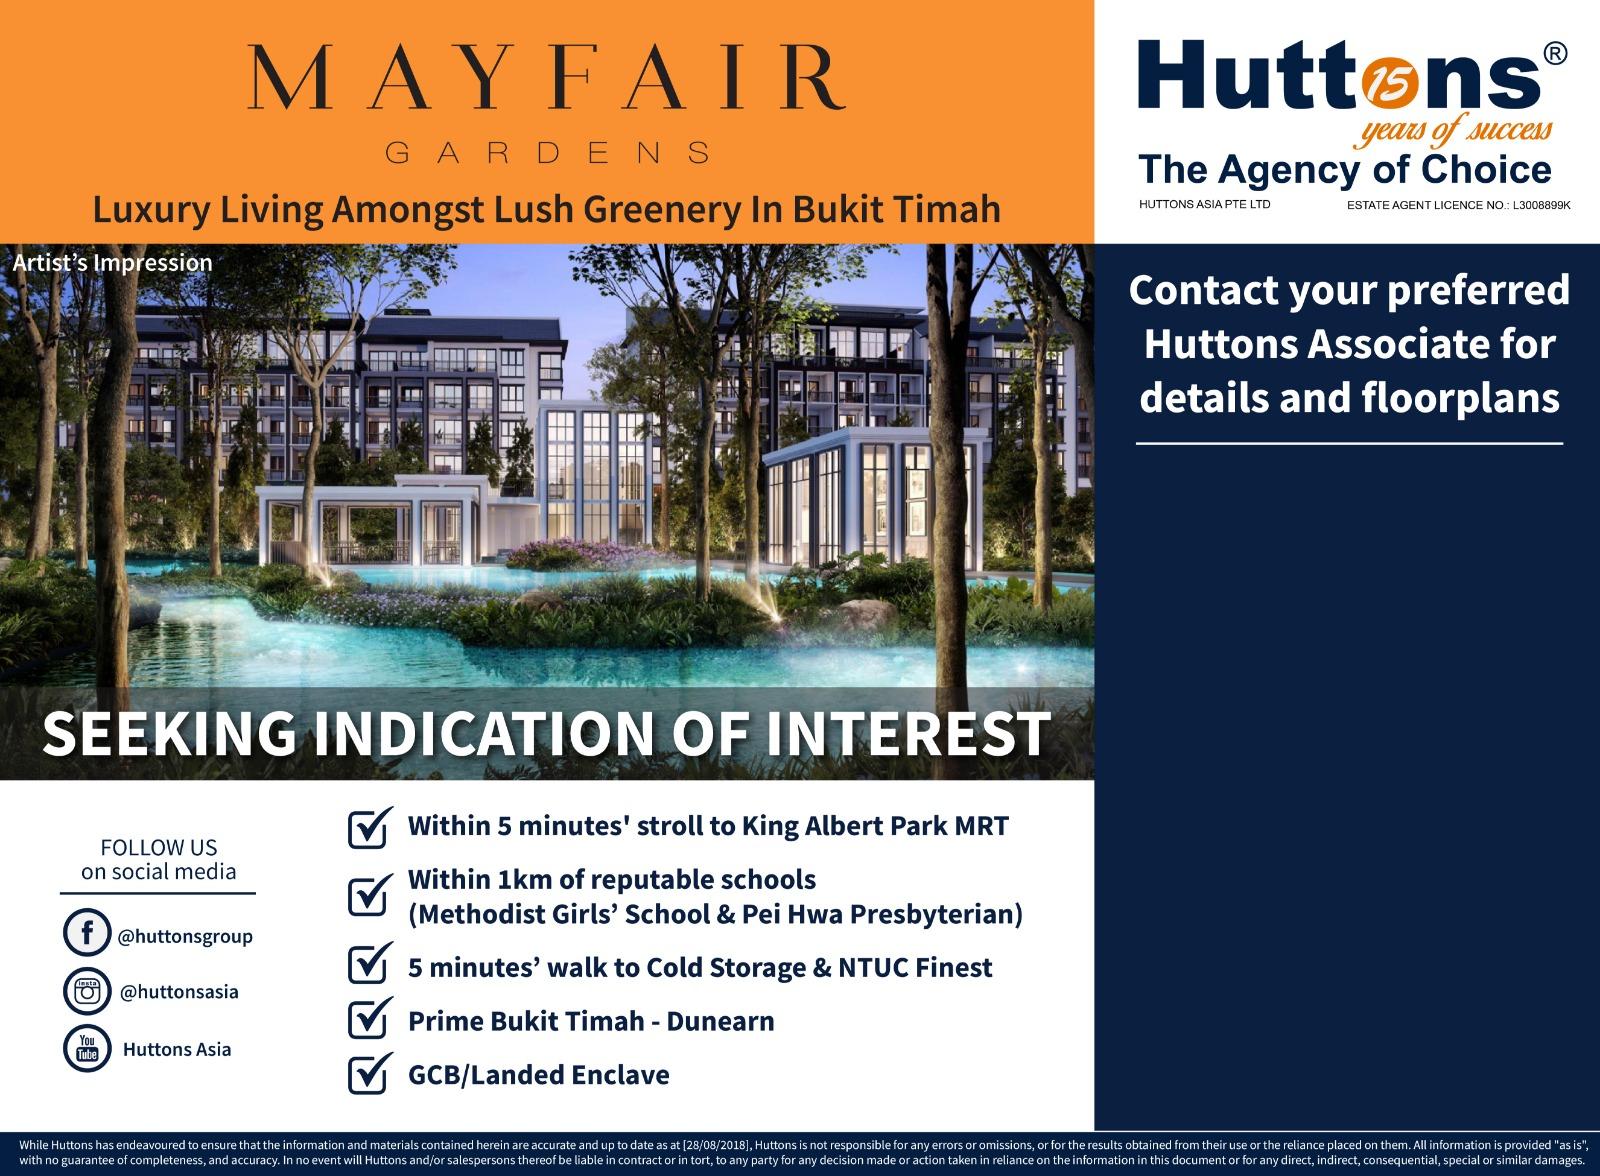 Mayfair Gardens indication of interest